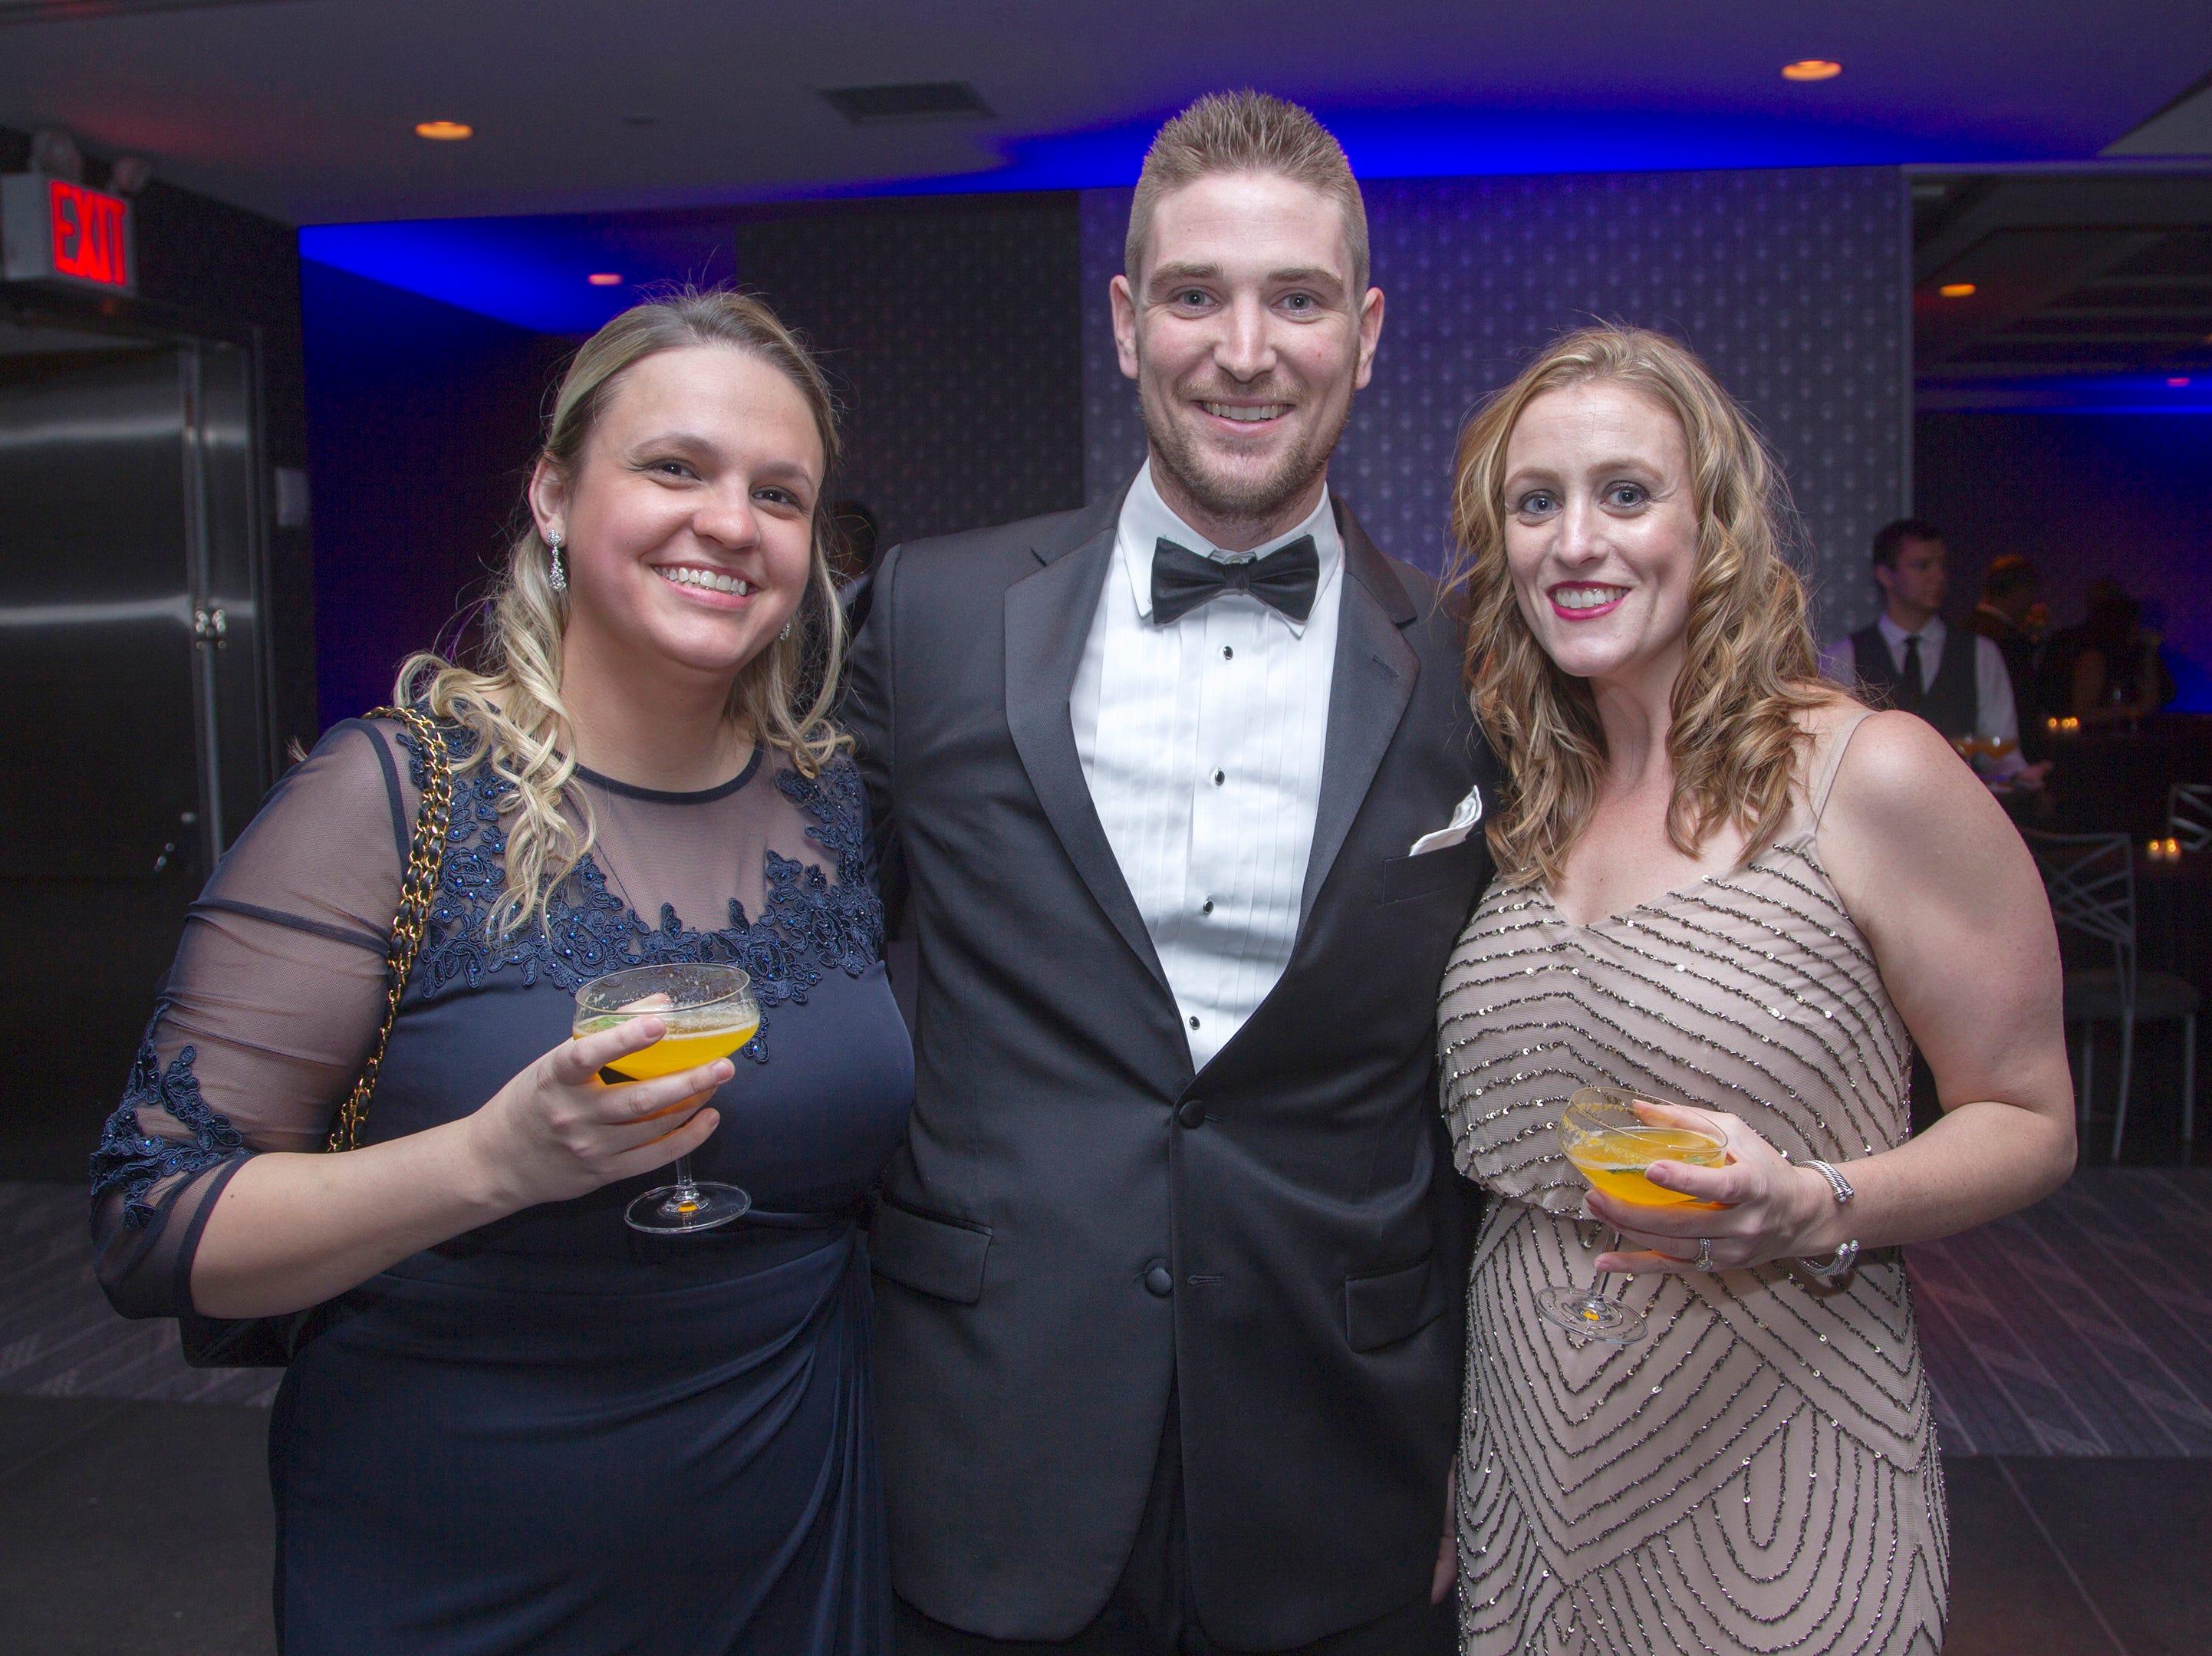 Christie Pfisterer, Eric Pfisterer, Dr. Christine Pfisterer. Holy Name Medical Center held its 2018 Founders Ball in NYC at Ziegfeld Ballroom. 11/17/2018